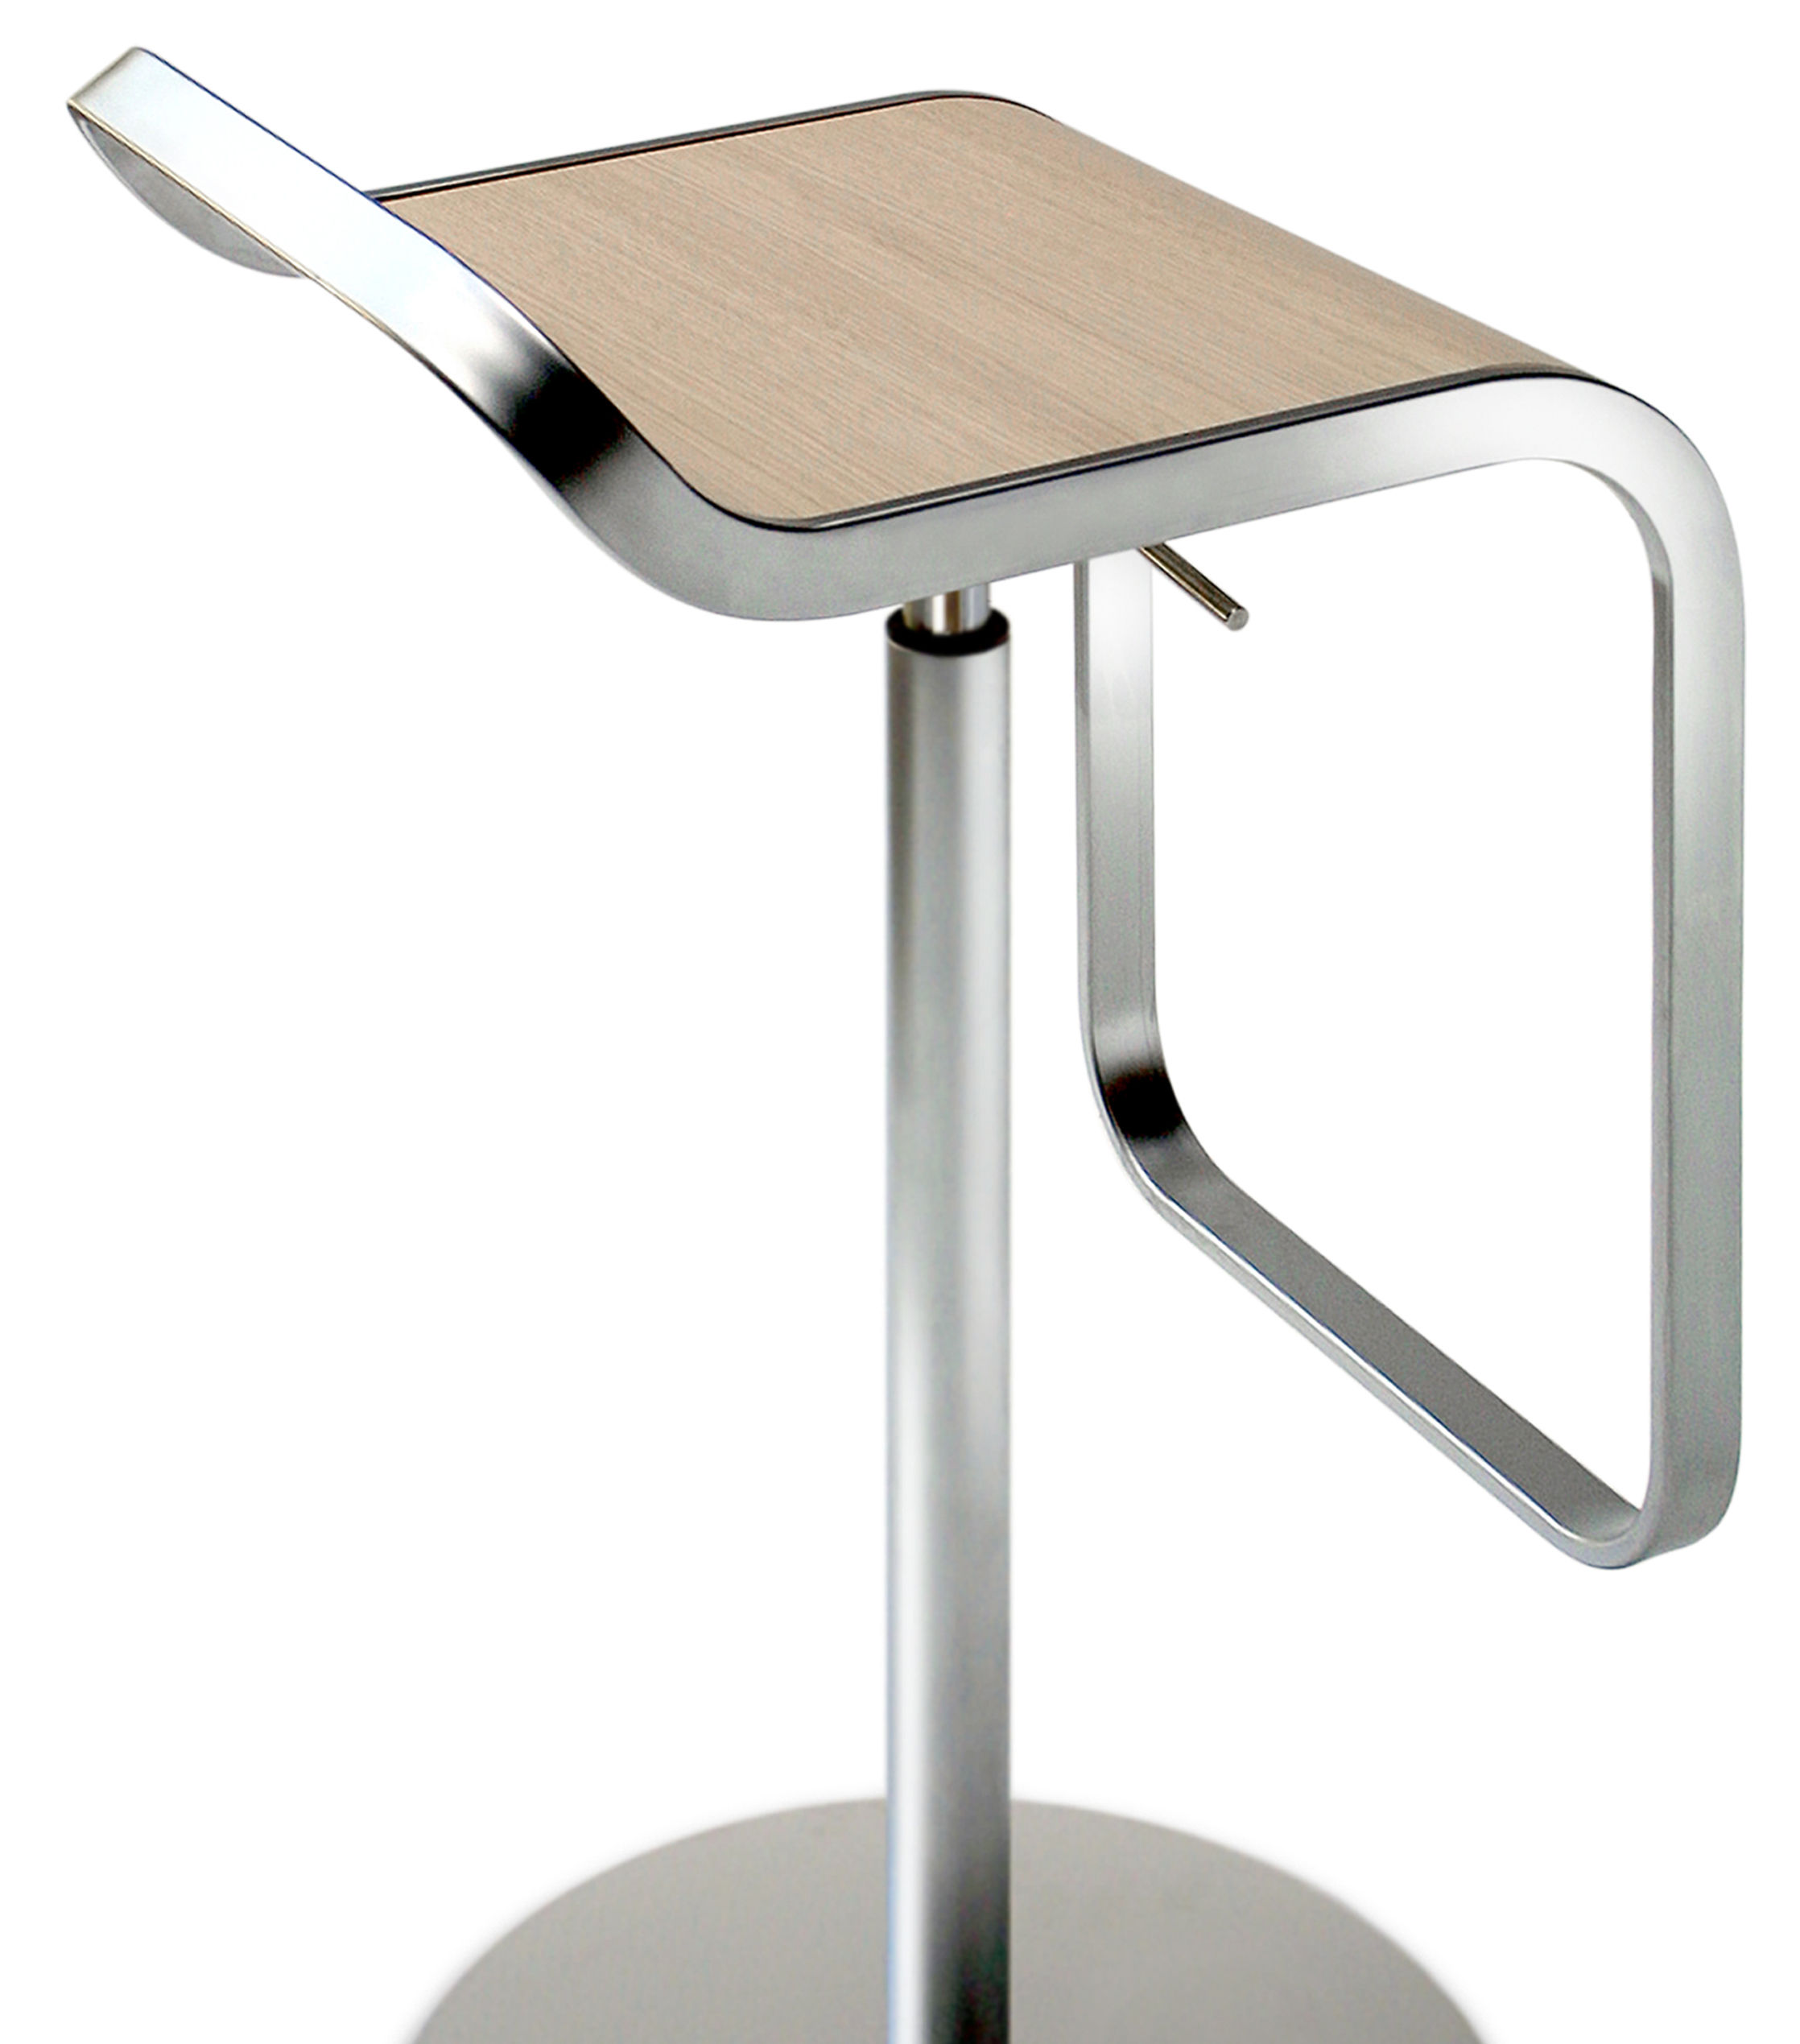 Lem Adjustable Bar Stool Pivoting Wood Seat Lacquered